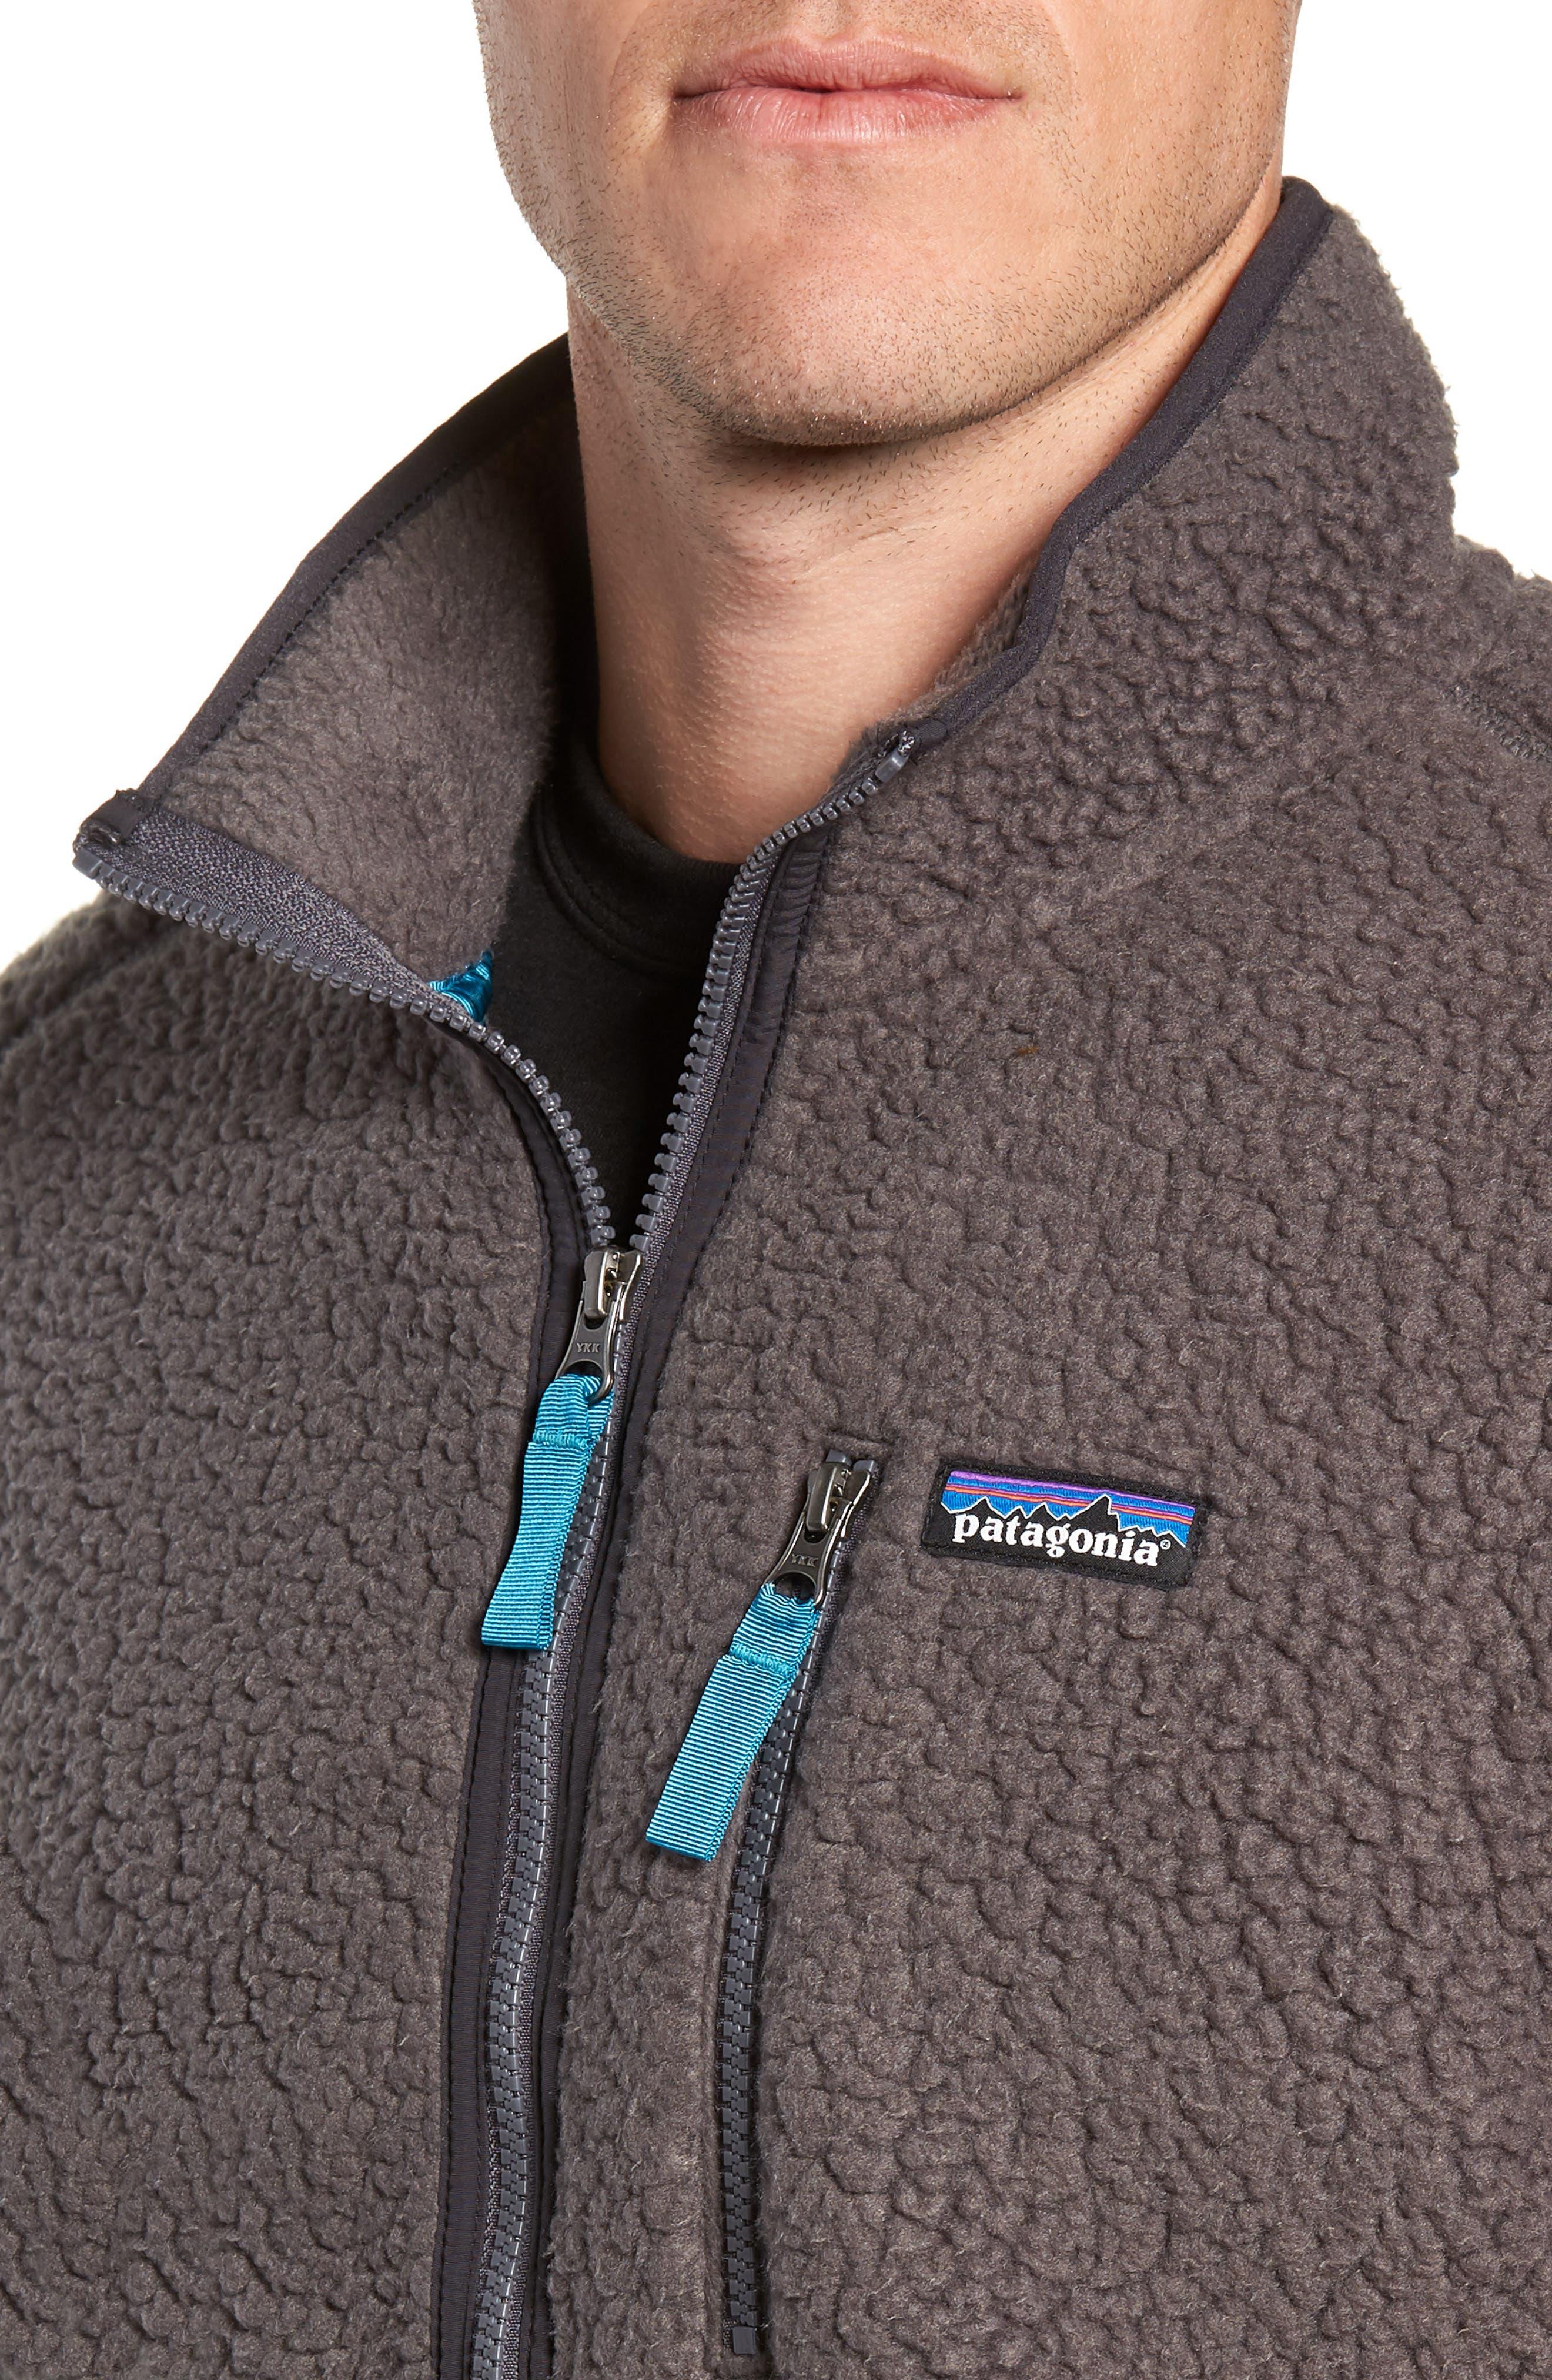 Retro Pile Fleece Zip Jacket,                             Alternate thumbnail 4, color,                             FORGE GREY